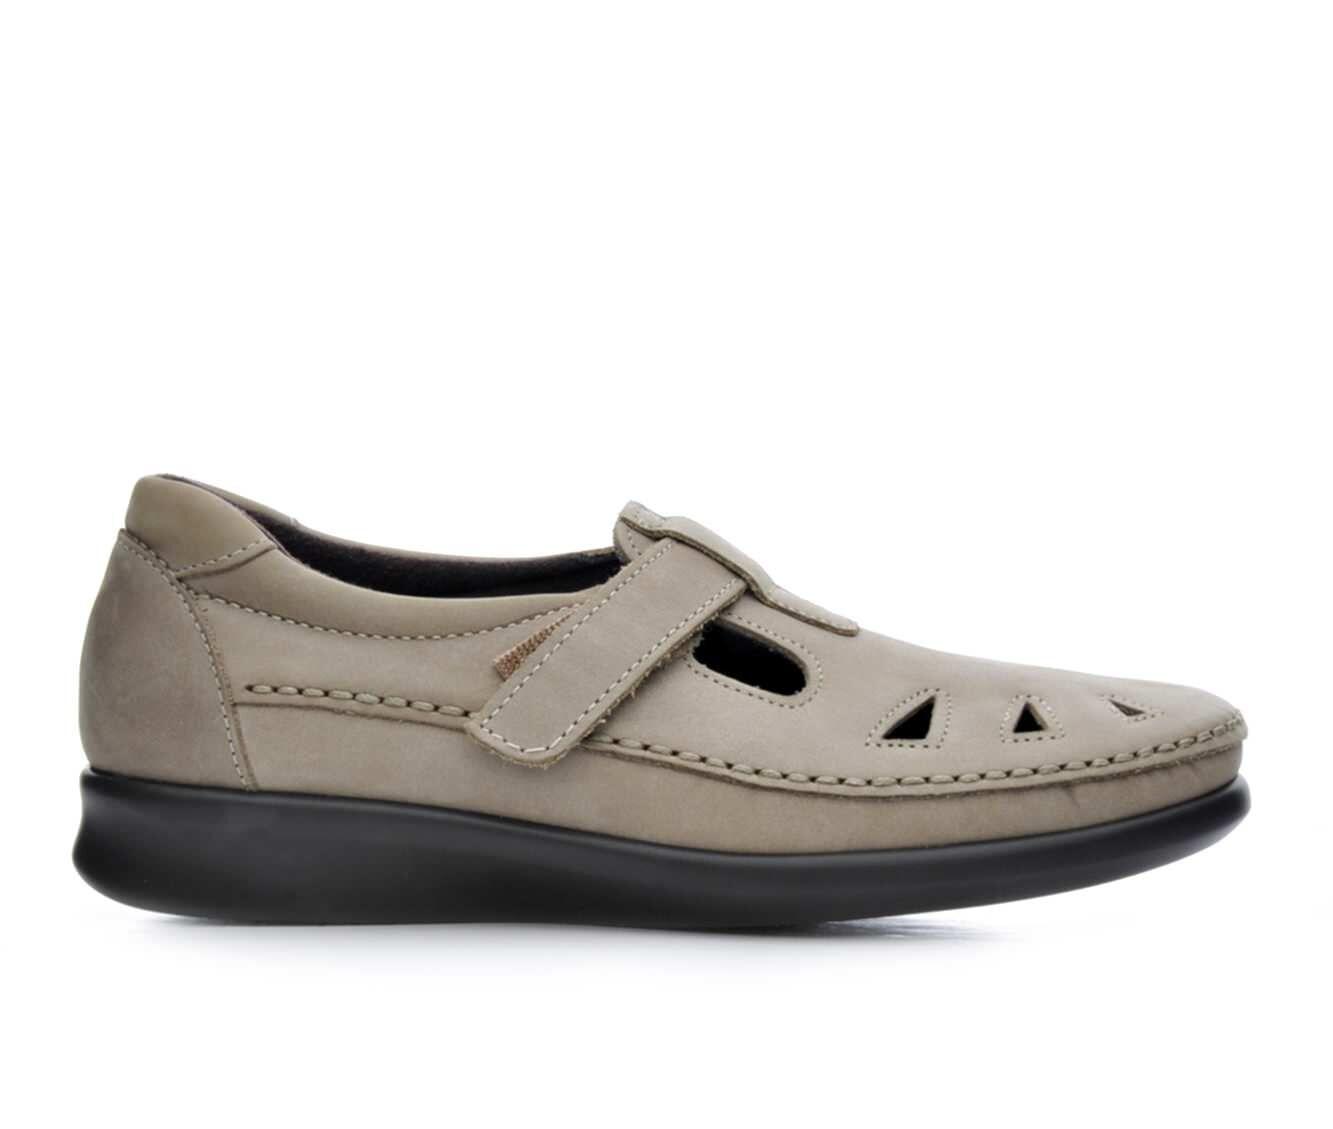 Women's Sas Roamer Comfort Shoes Sage